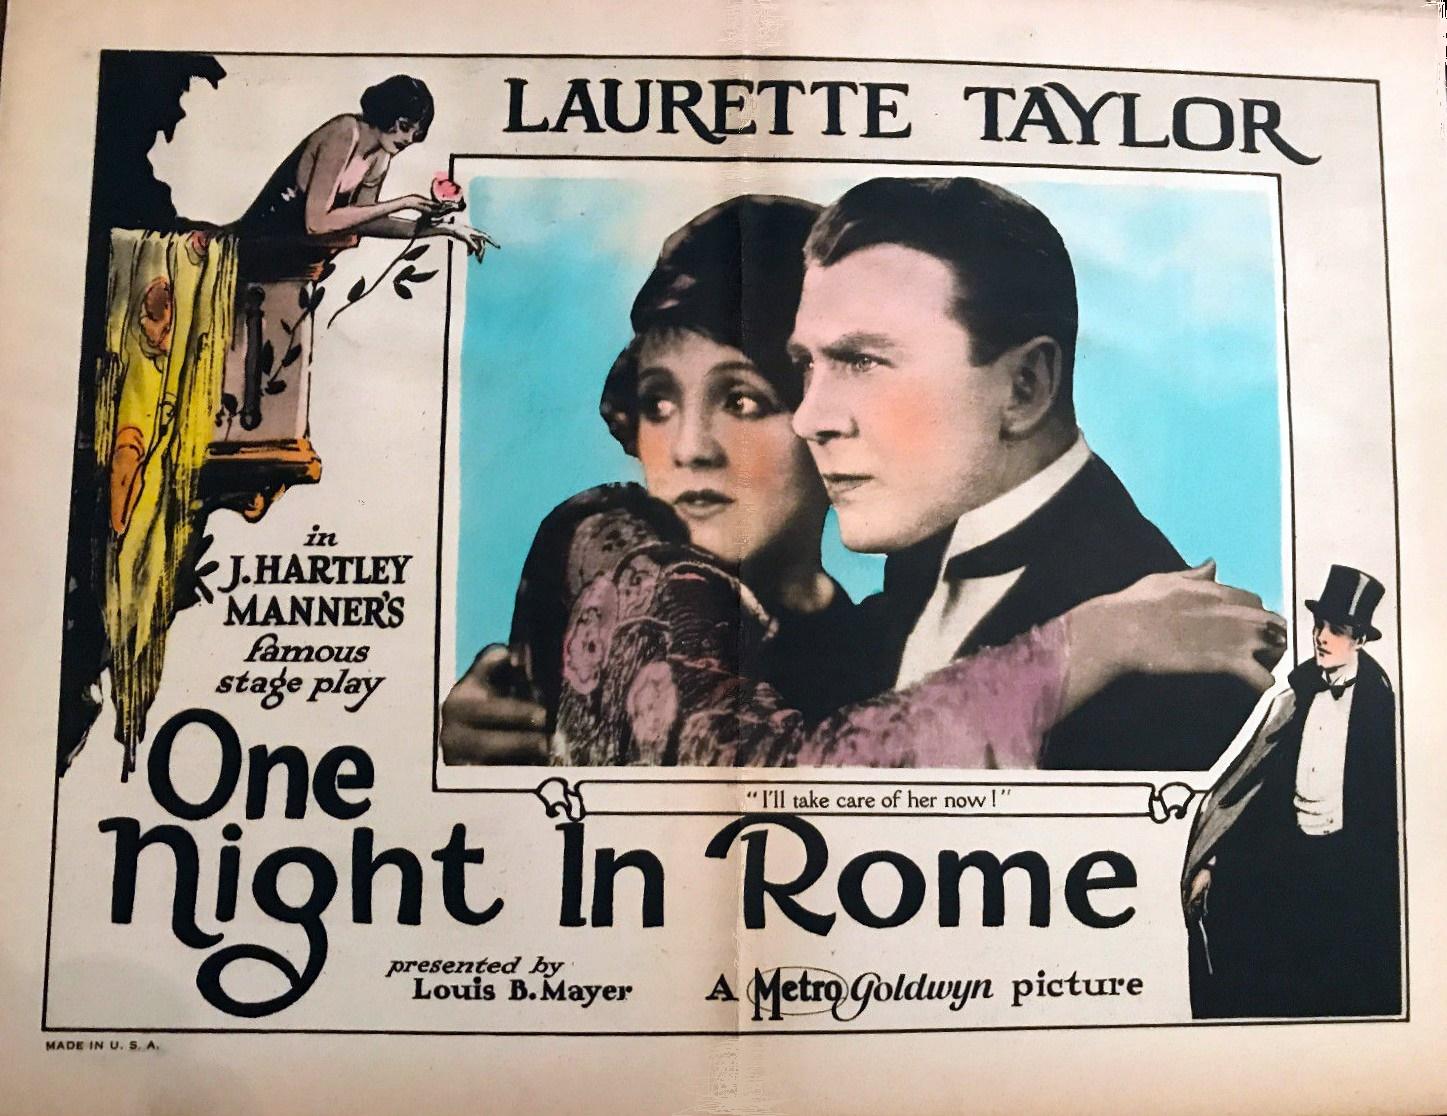 One Night in Rome - Wikipedia